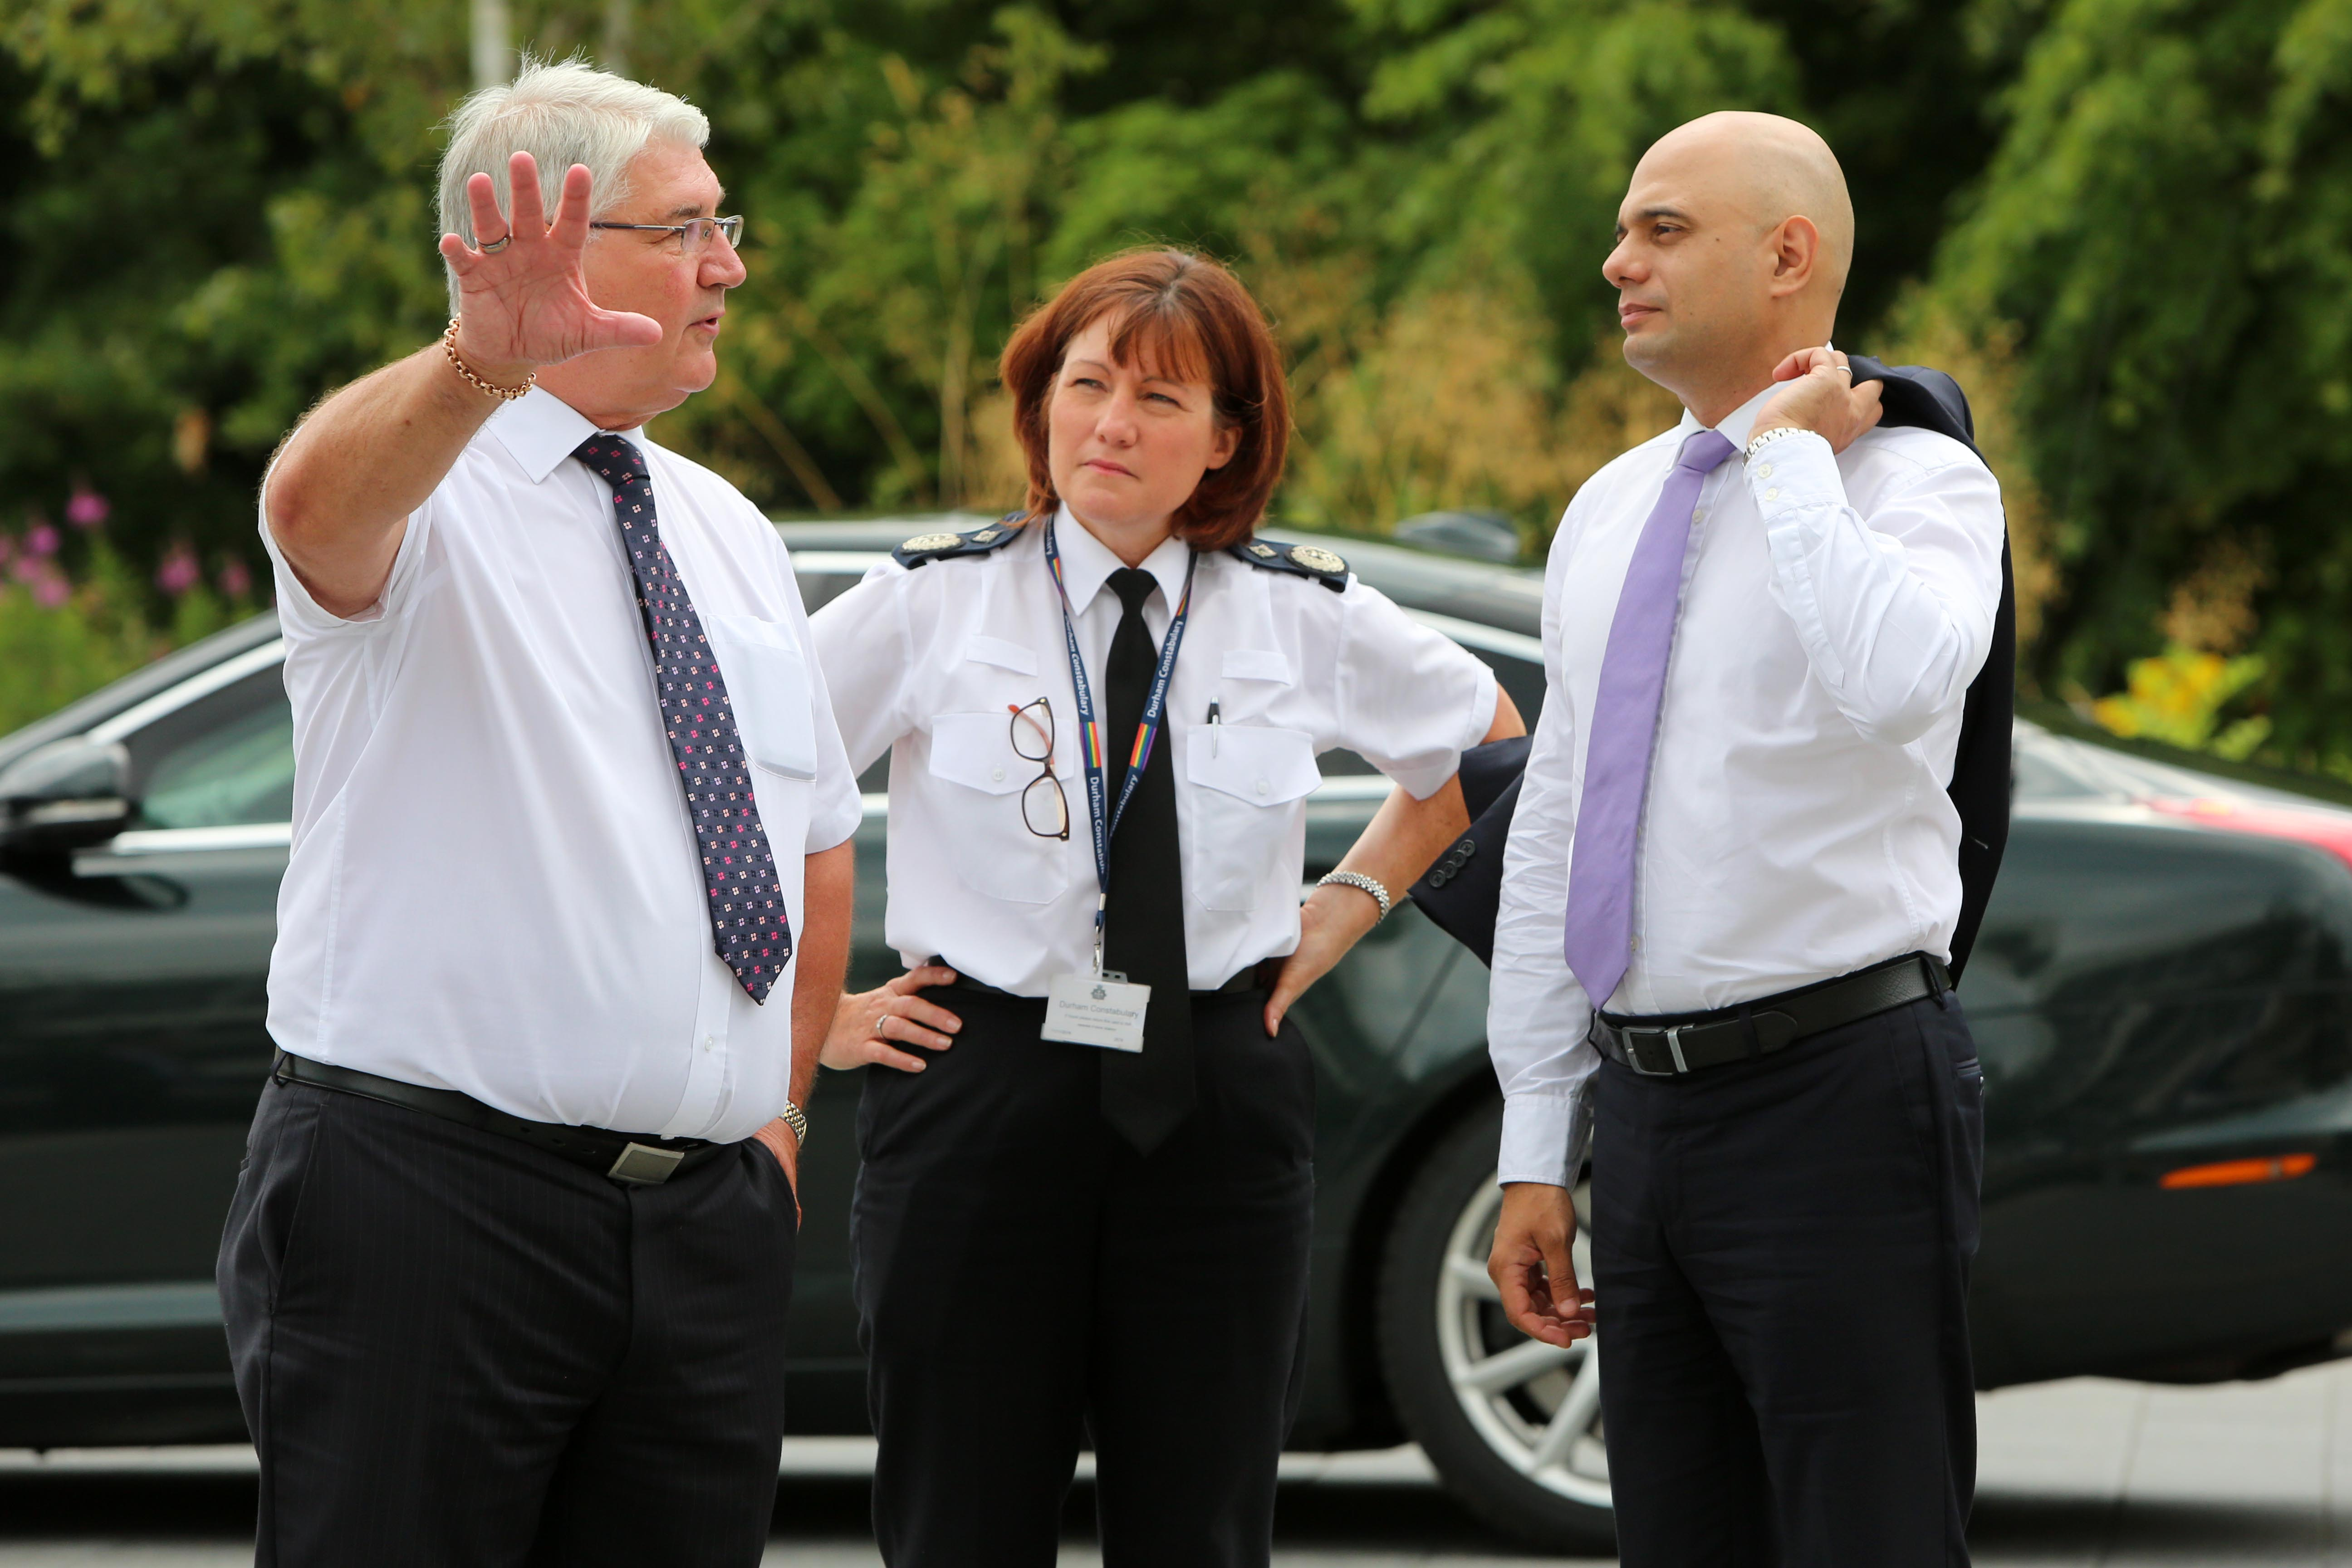 Home Secretary Visits Durham Constabulary